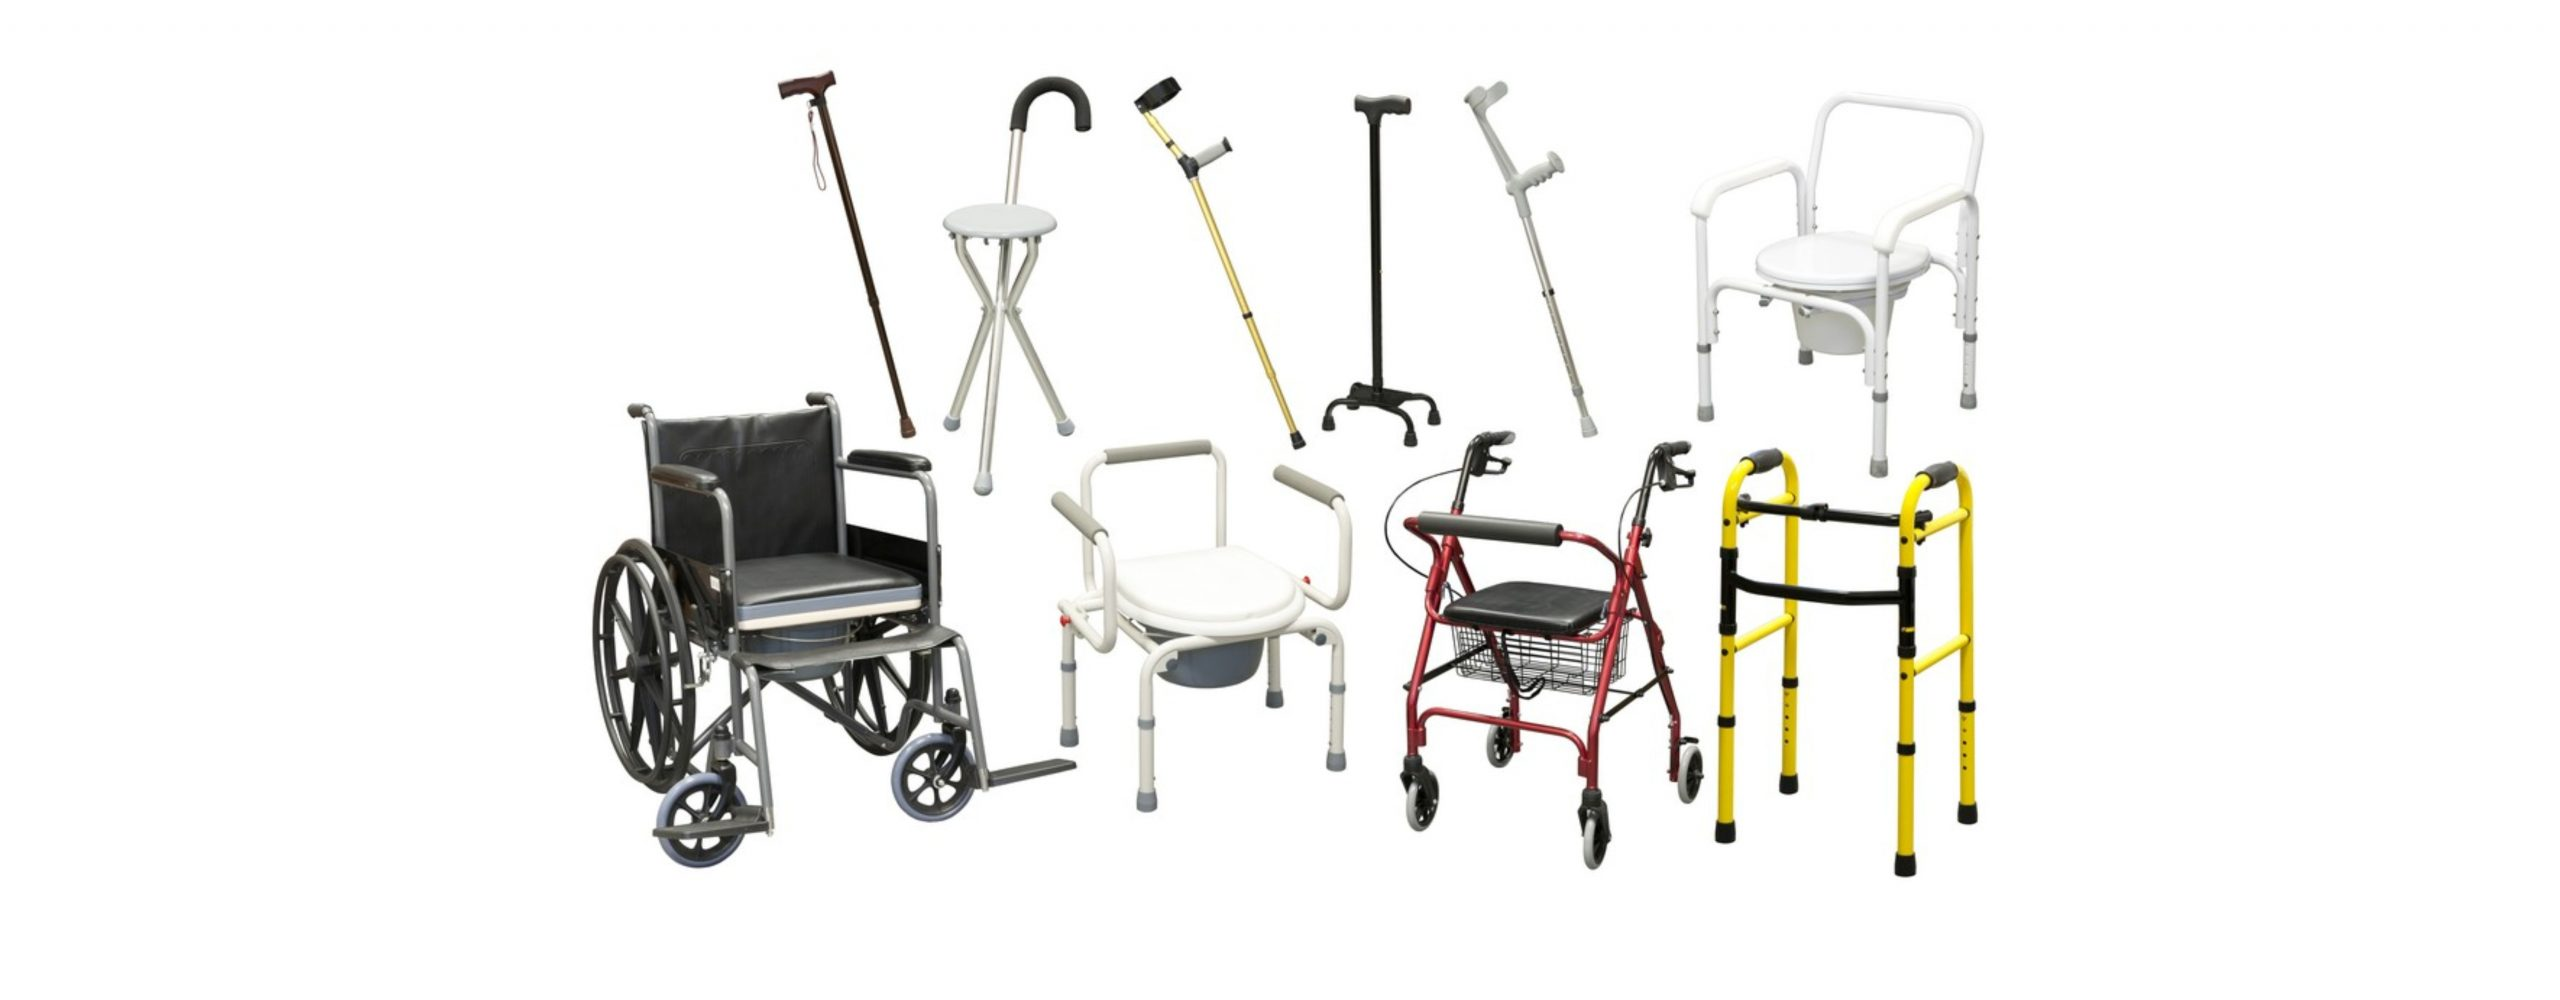 accessories for invalids